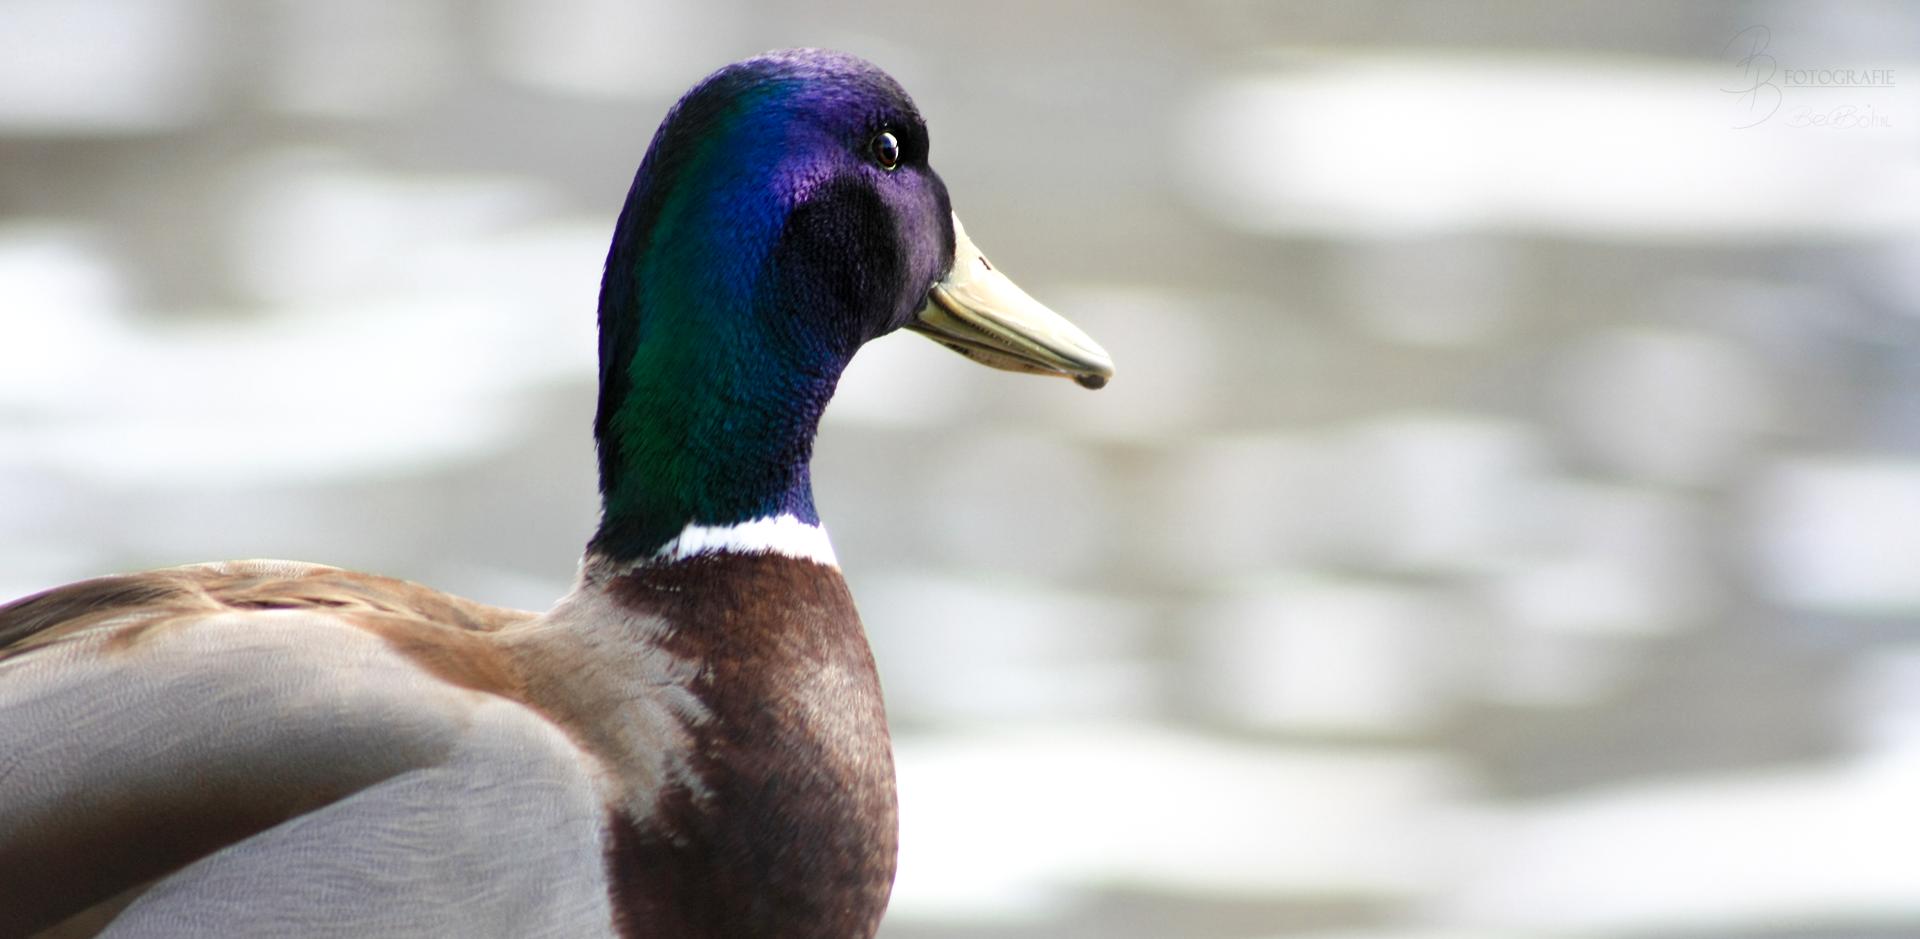 11 Ente lässt den Blick schweifen